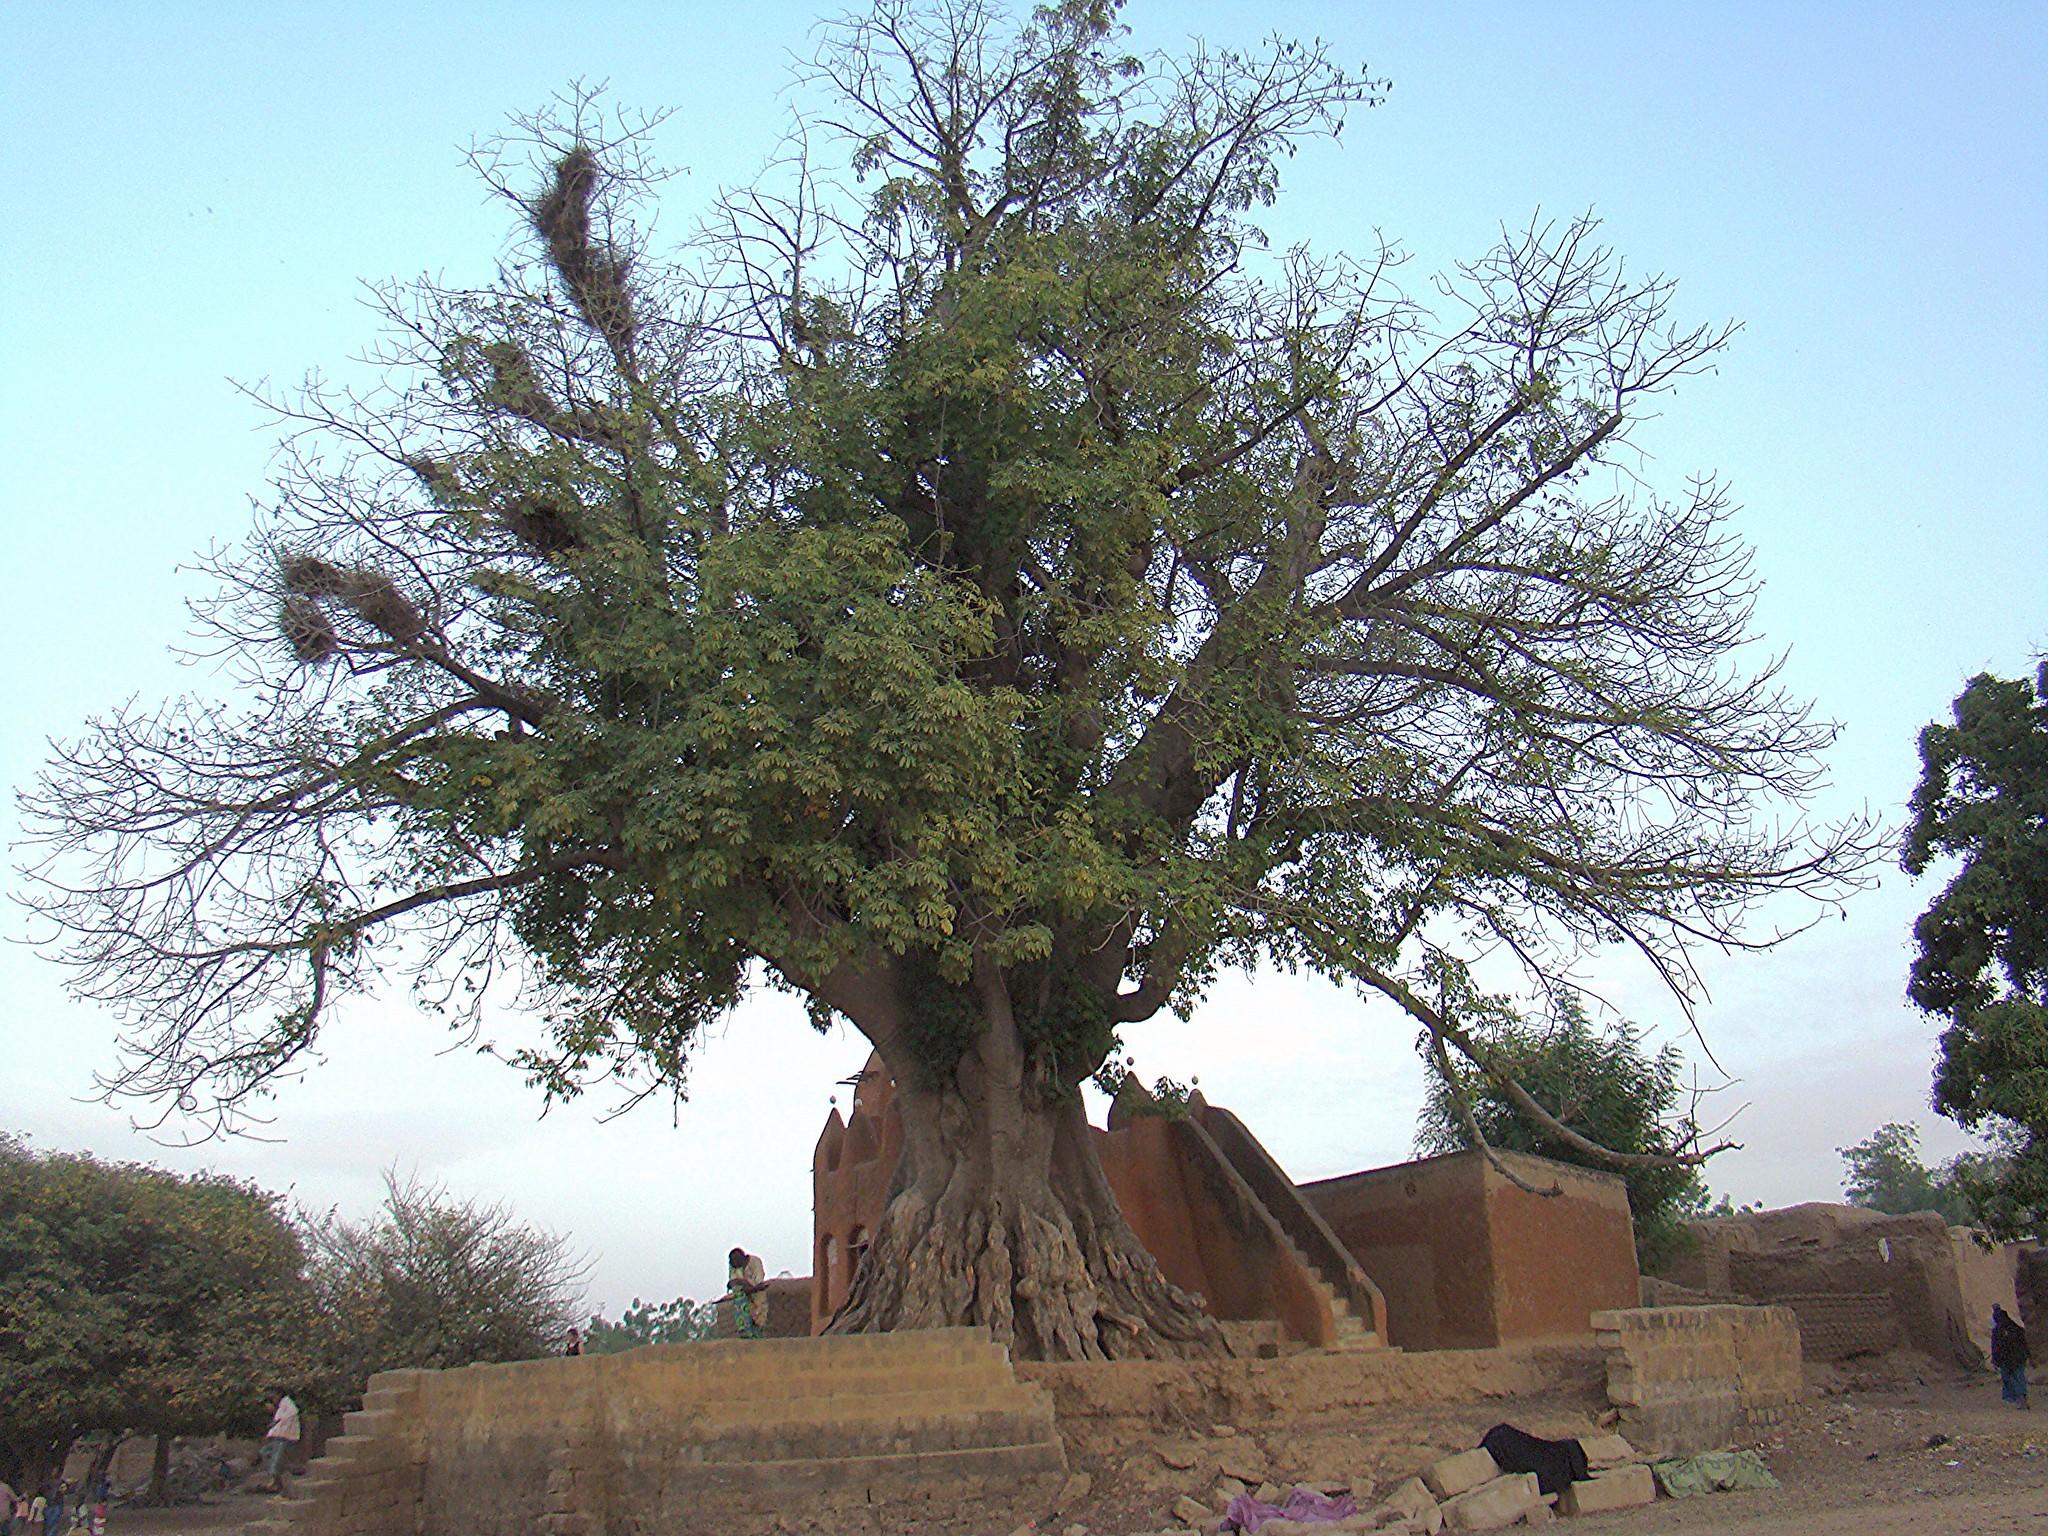 Baobabs arbol de Mali